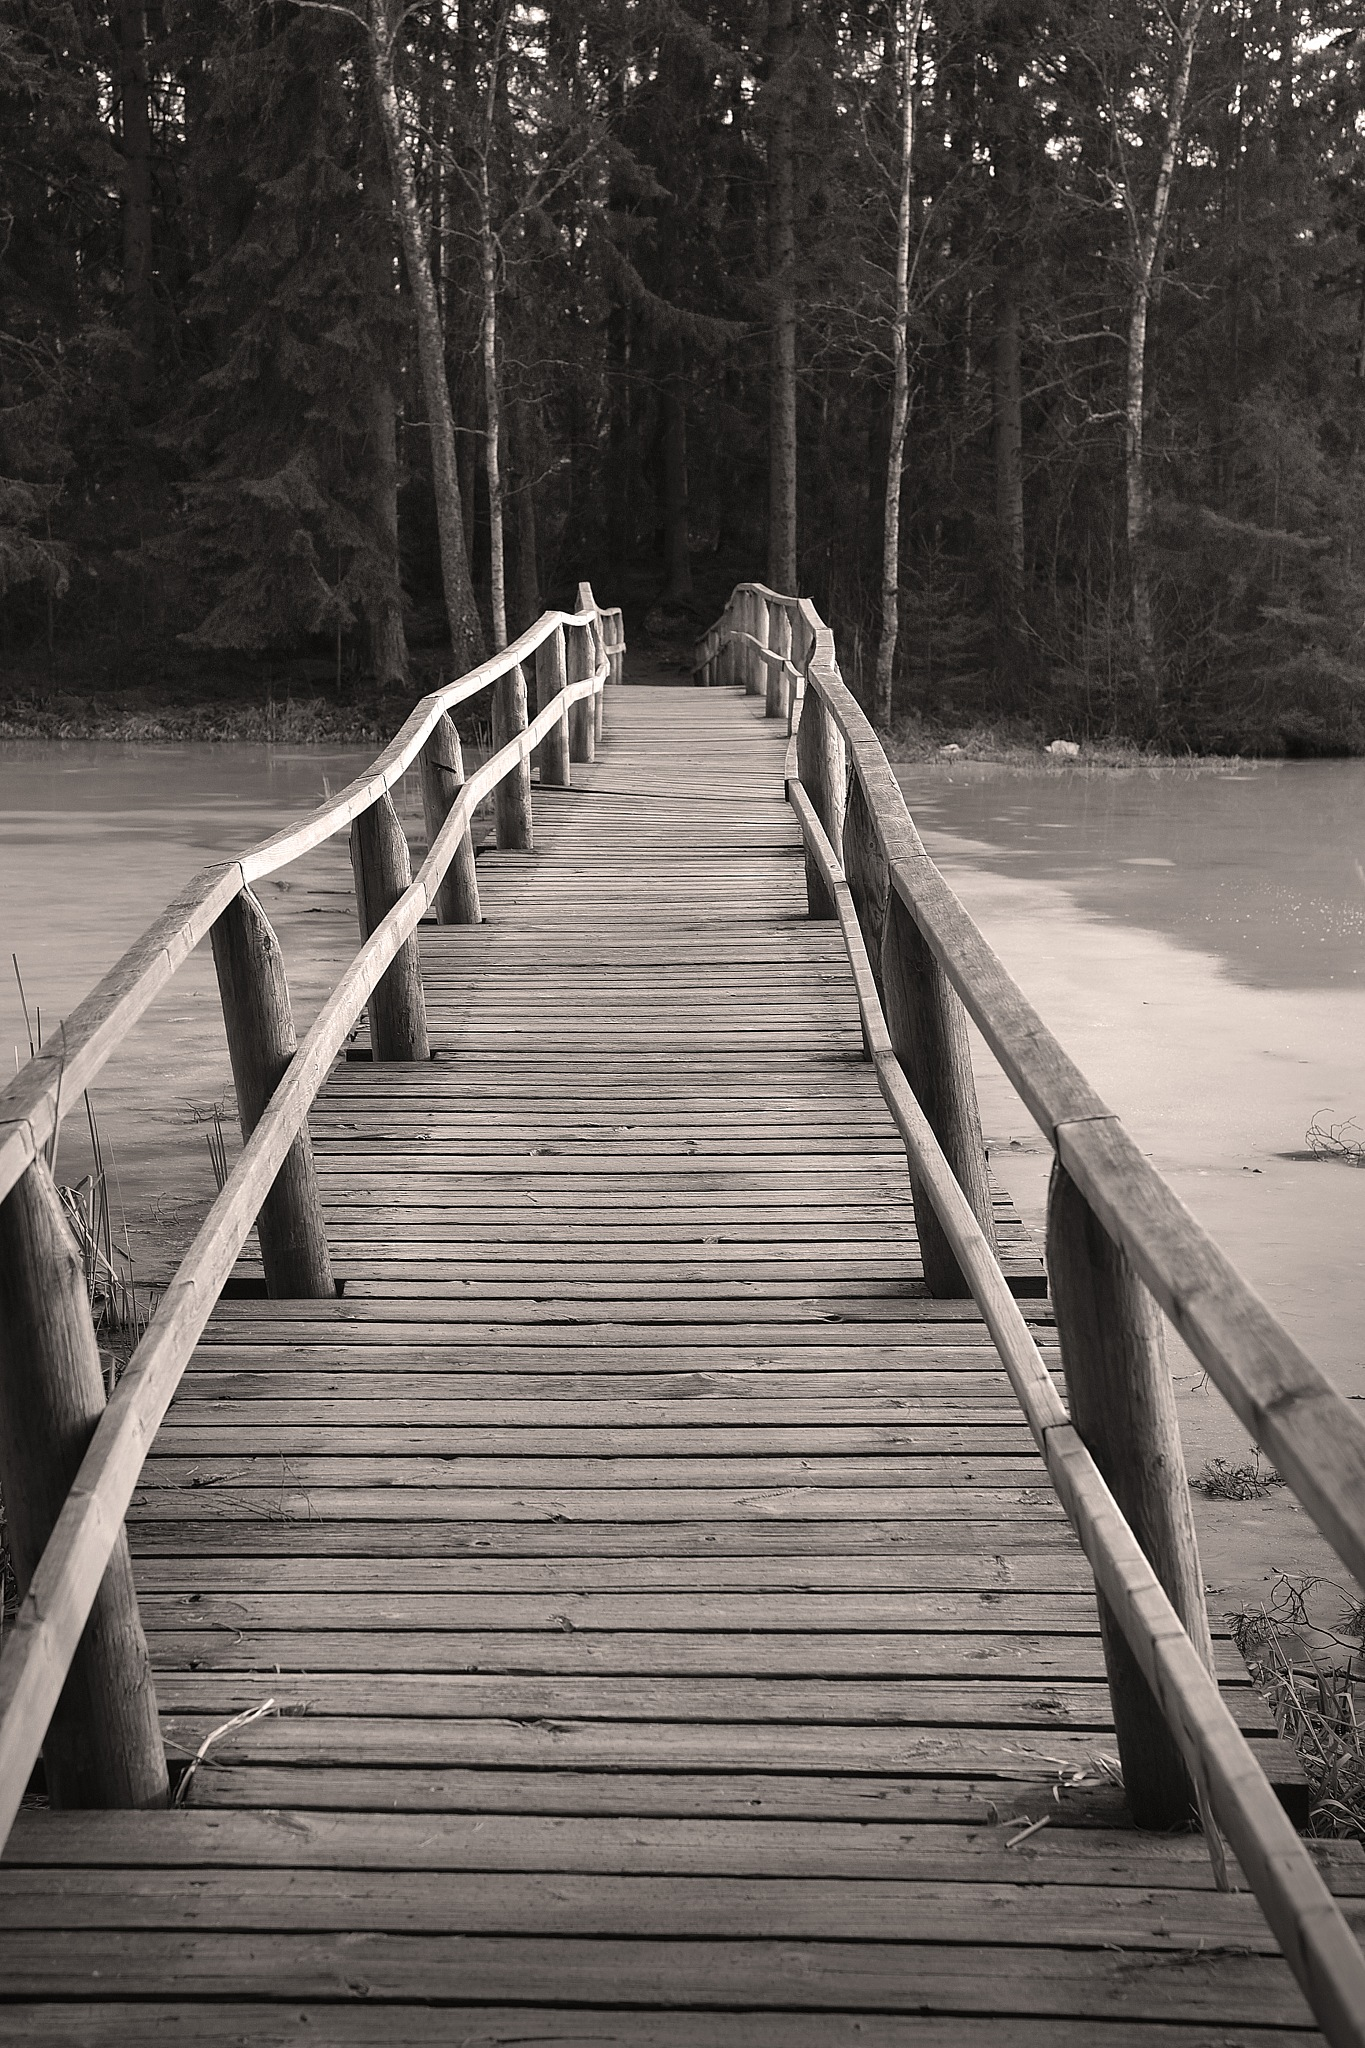 Small wooden bridge by Lars Flodmark